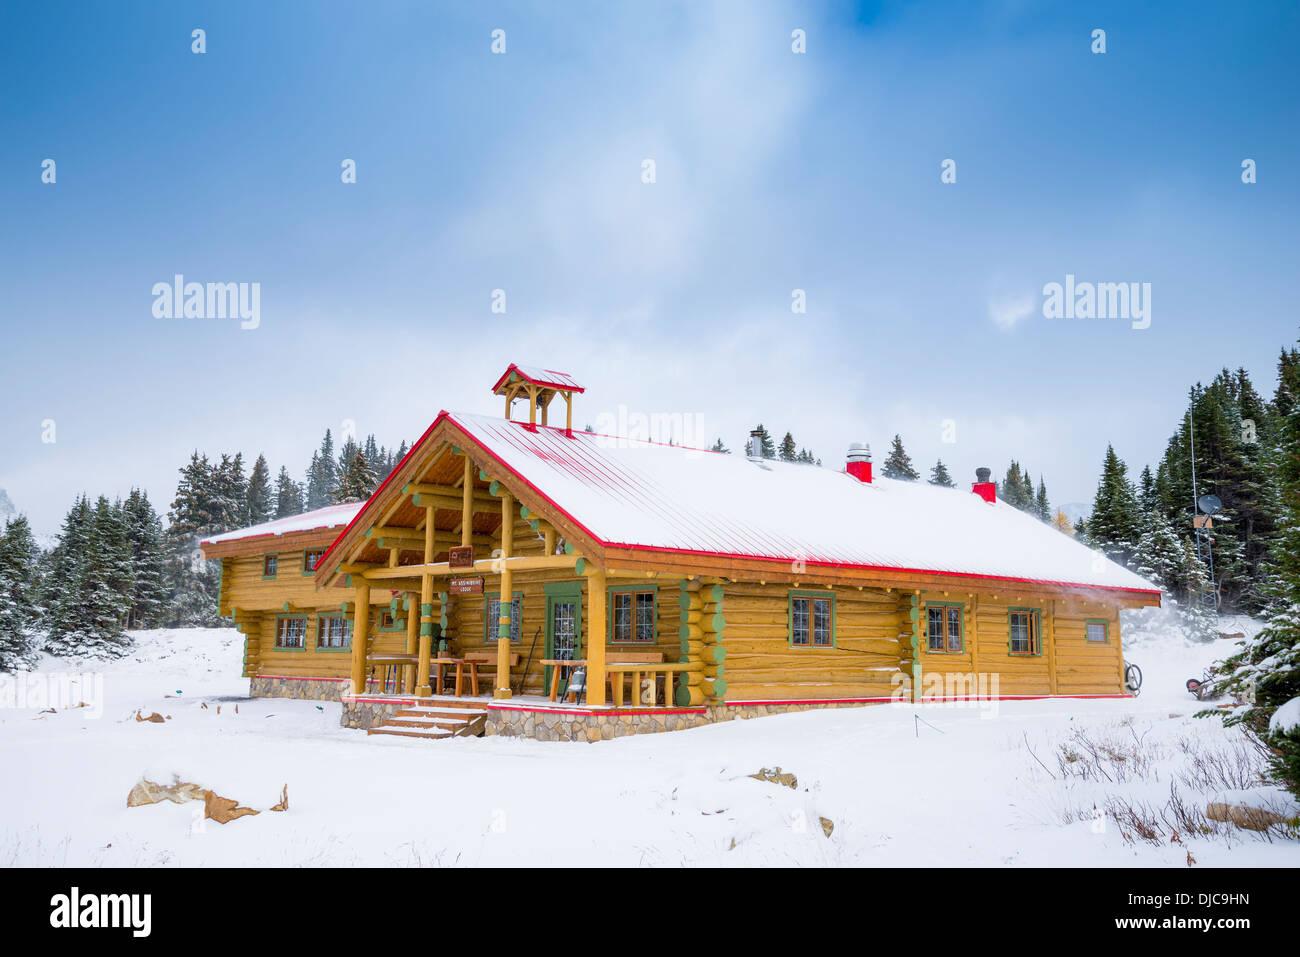 Mount Assiniboine Lodge, Mount Assiniboine Provincial Park, British Columbia, Canada - Stock Image